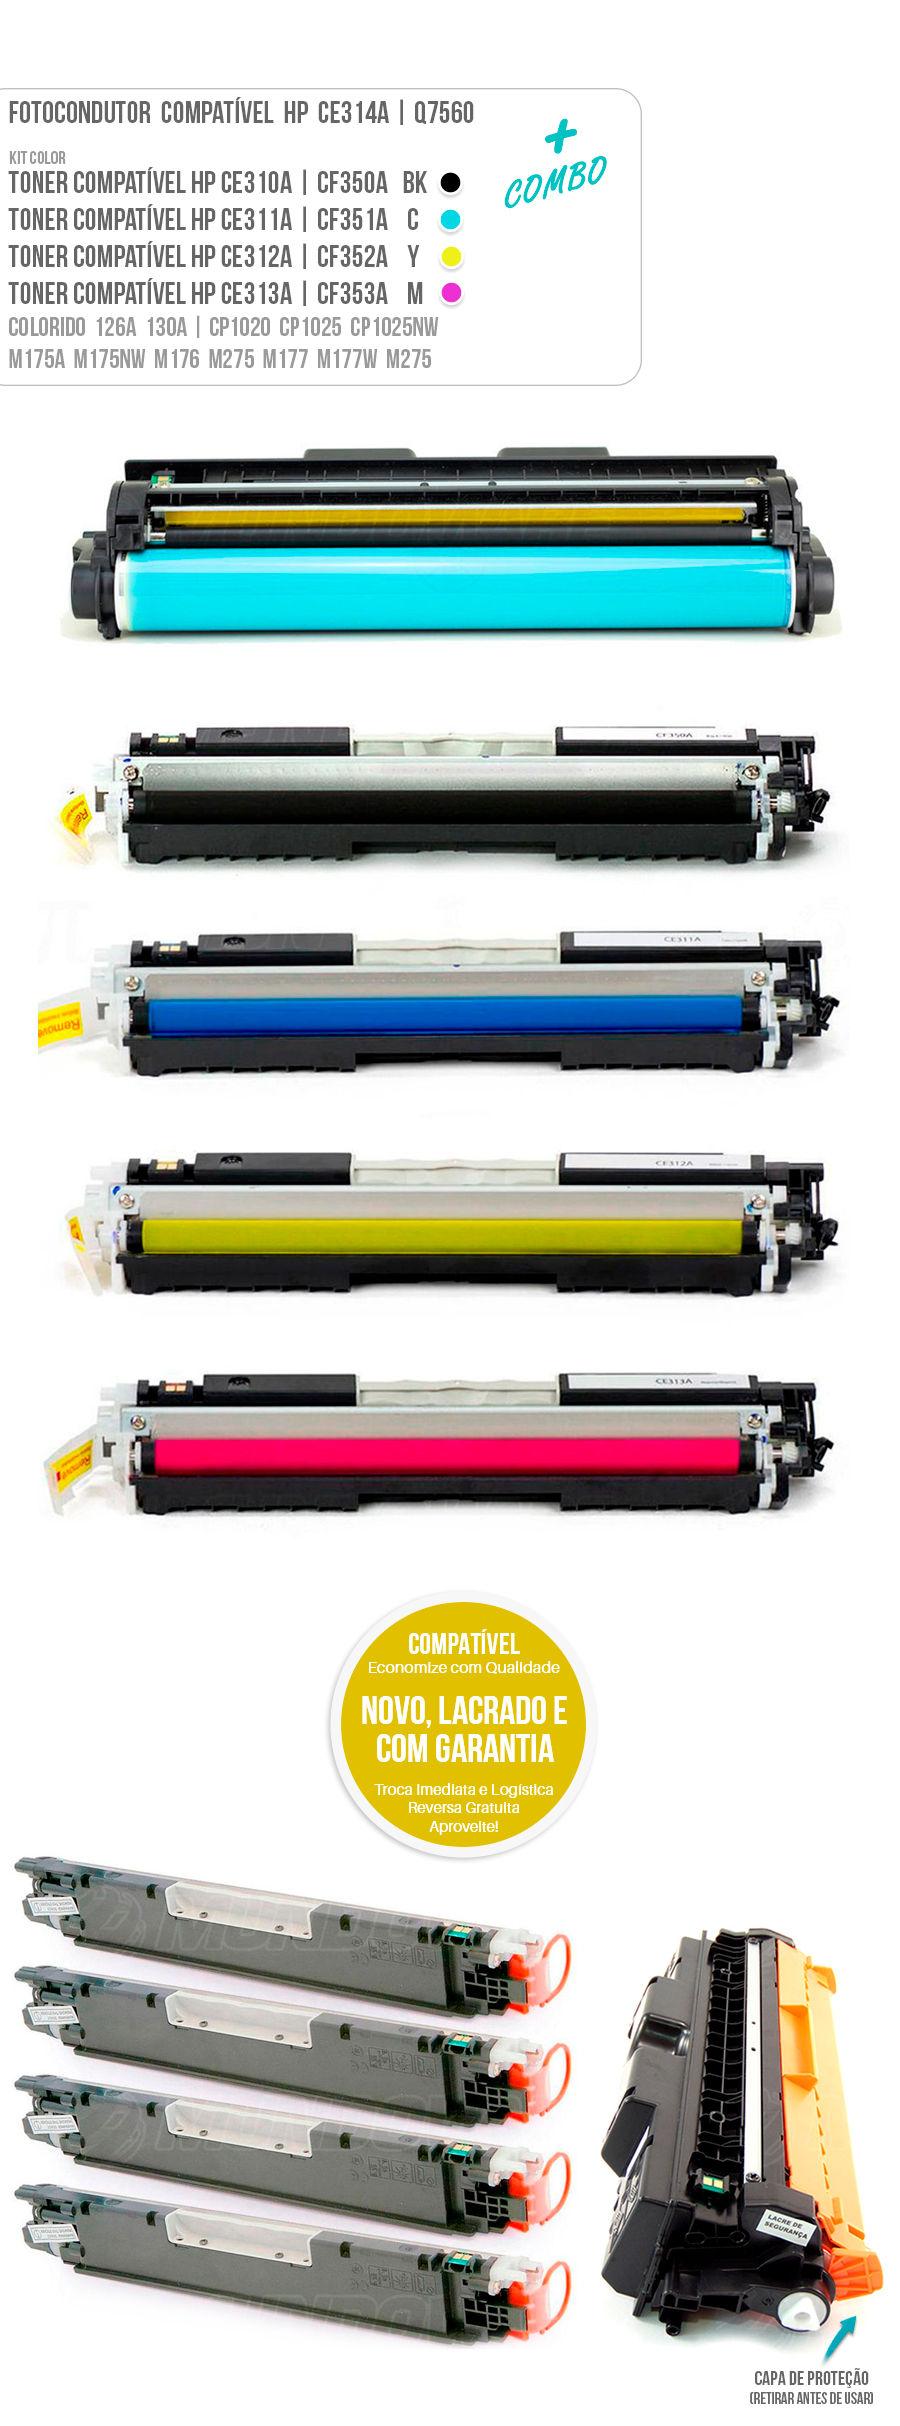 Drum Fotocondutor Tambor de Imagem Unidade Cilindro Kit DR Toner Tonner Cartucho ce314a 126a 130a